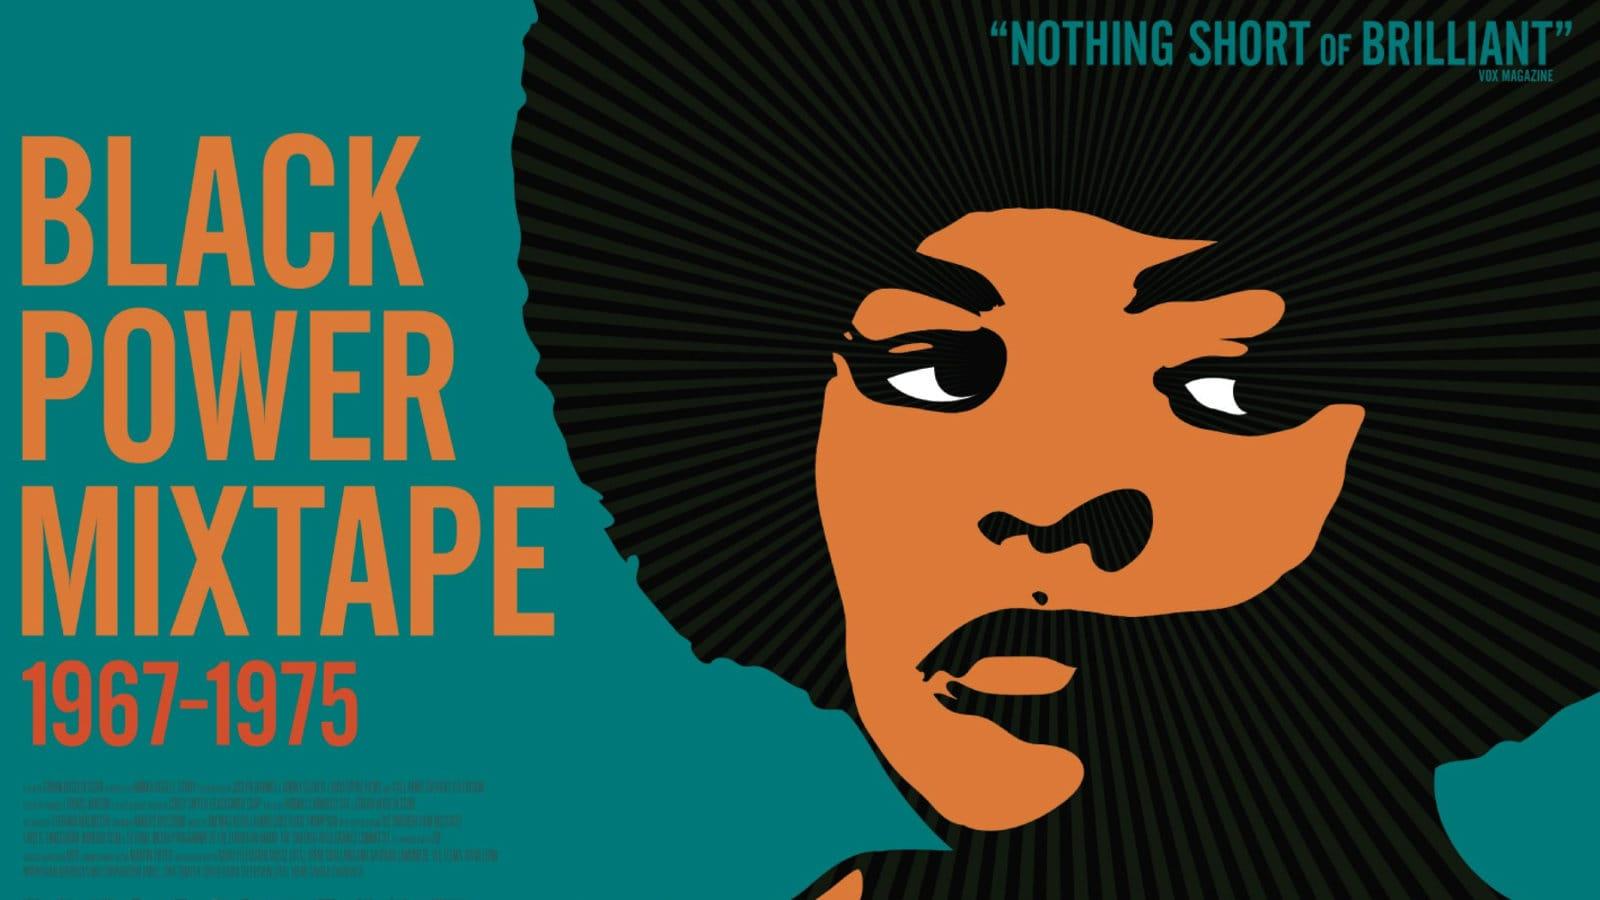 Tuesday 11.02.20 – 8:30pm: The Black Power Mixtape 1967-1975